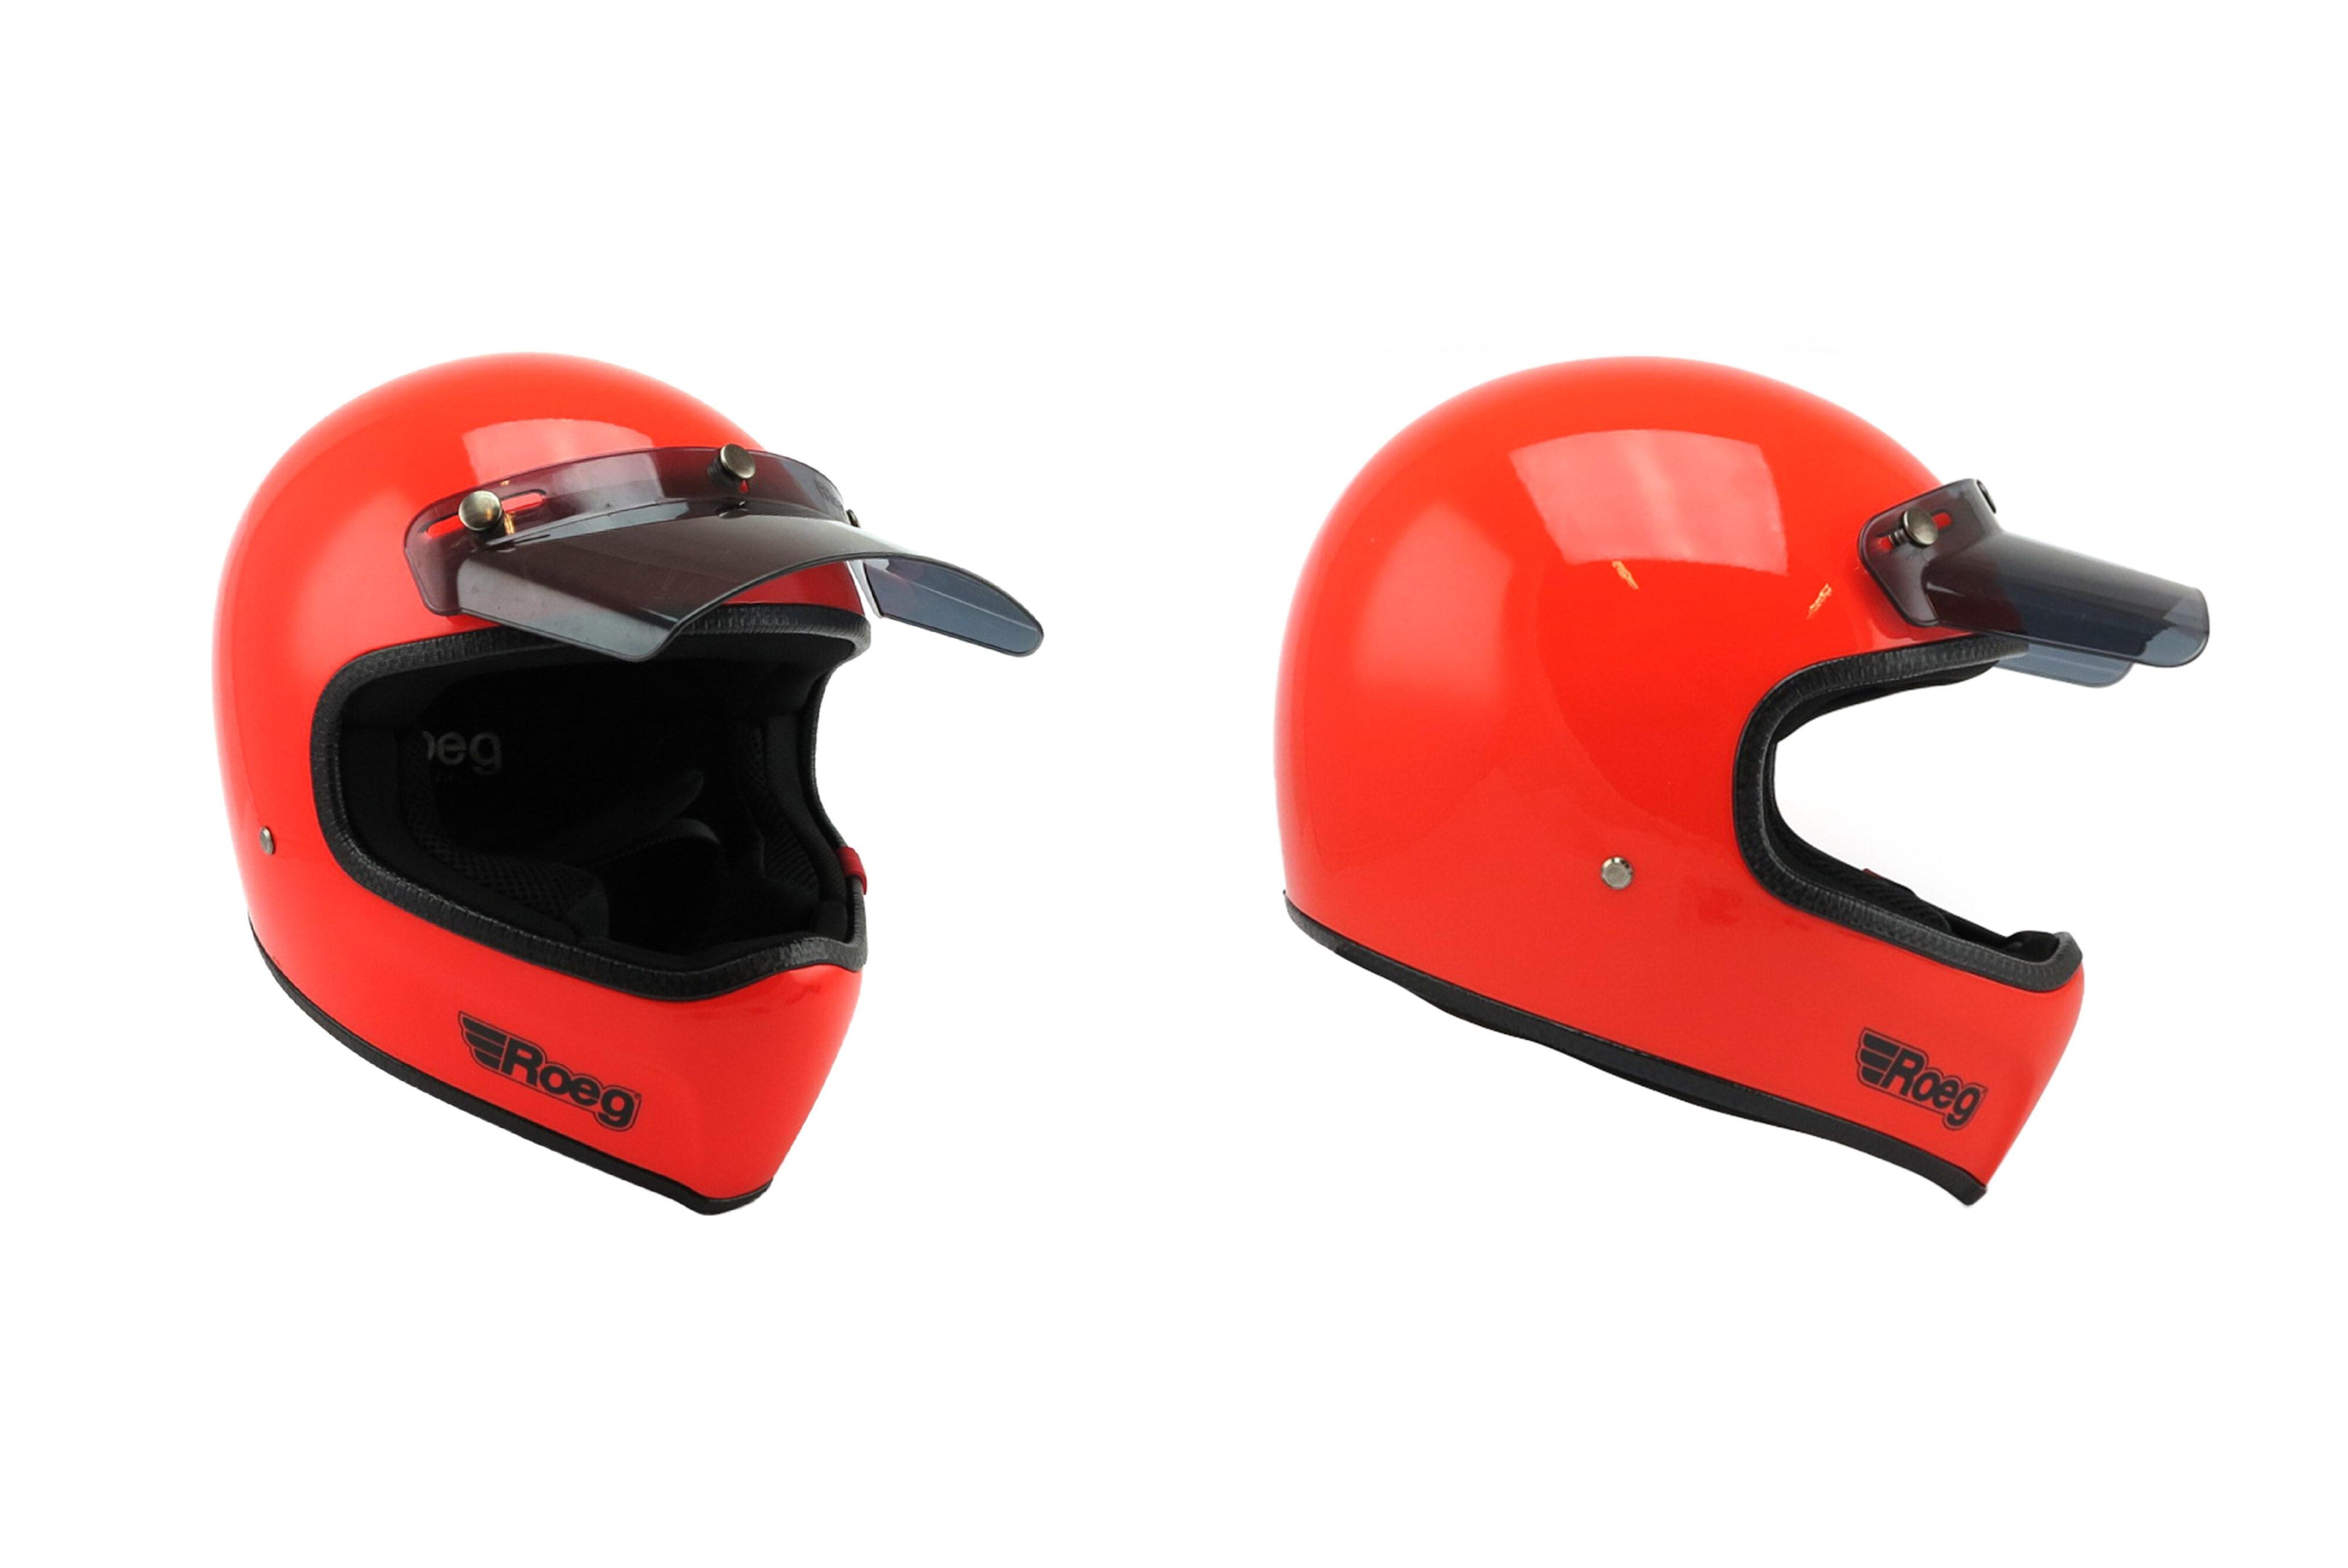 Roeg Pereuna Full Face Motorcycle Helmet